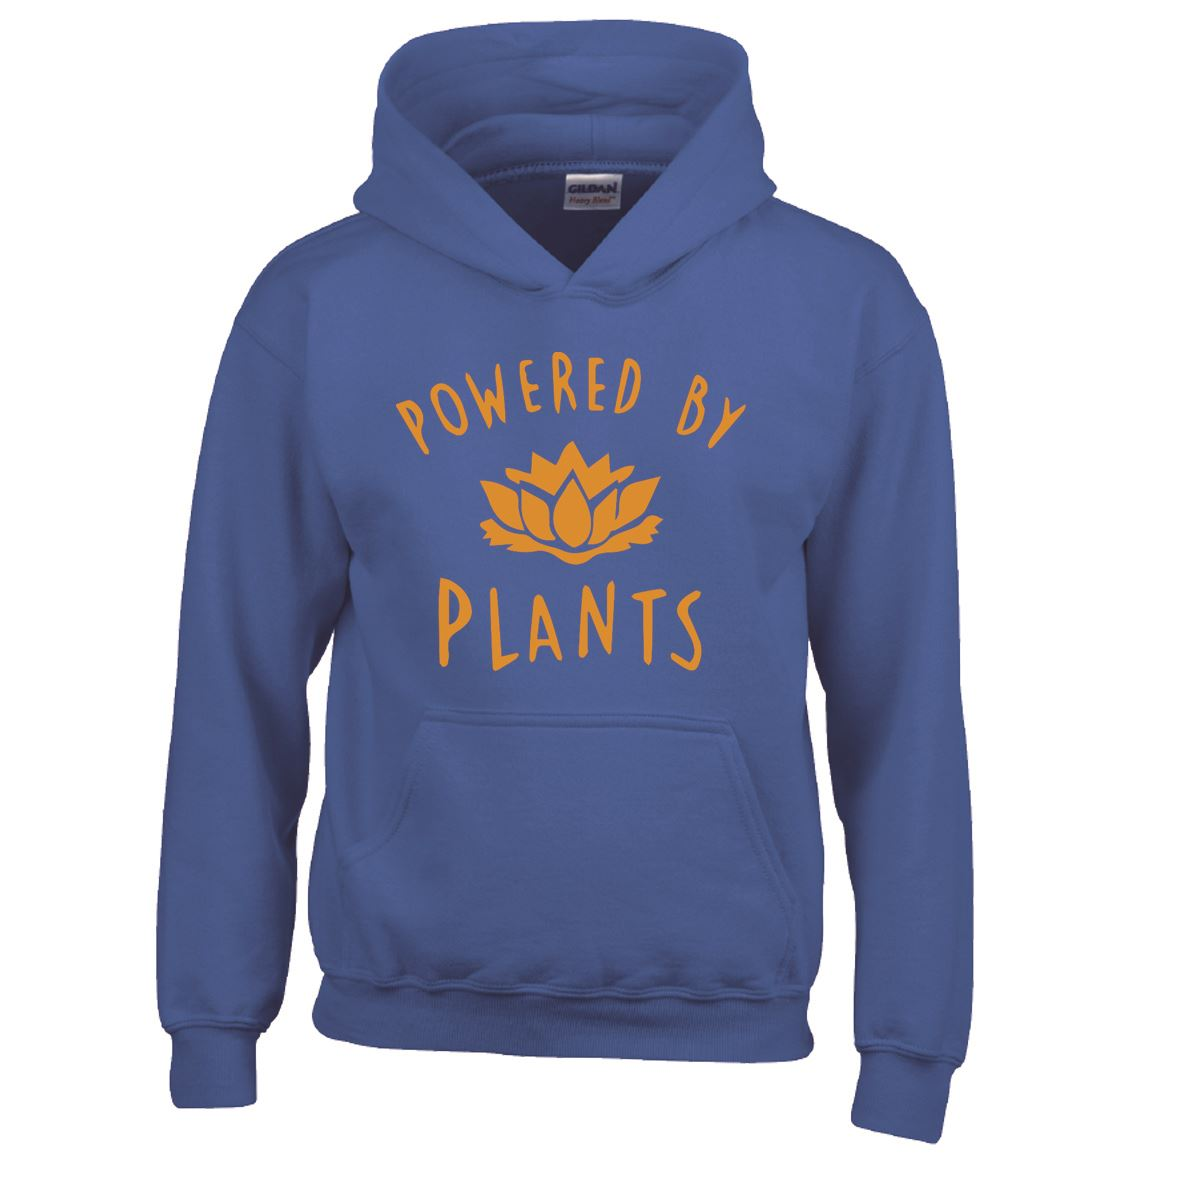 Plant Power Vegan Boys Girls Kids Childrens Hoodie